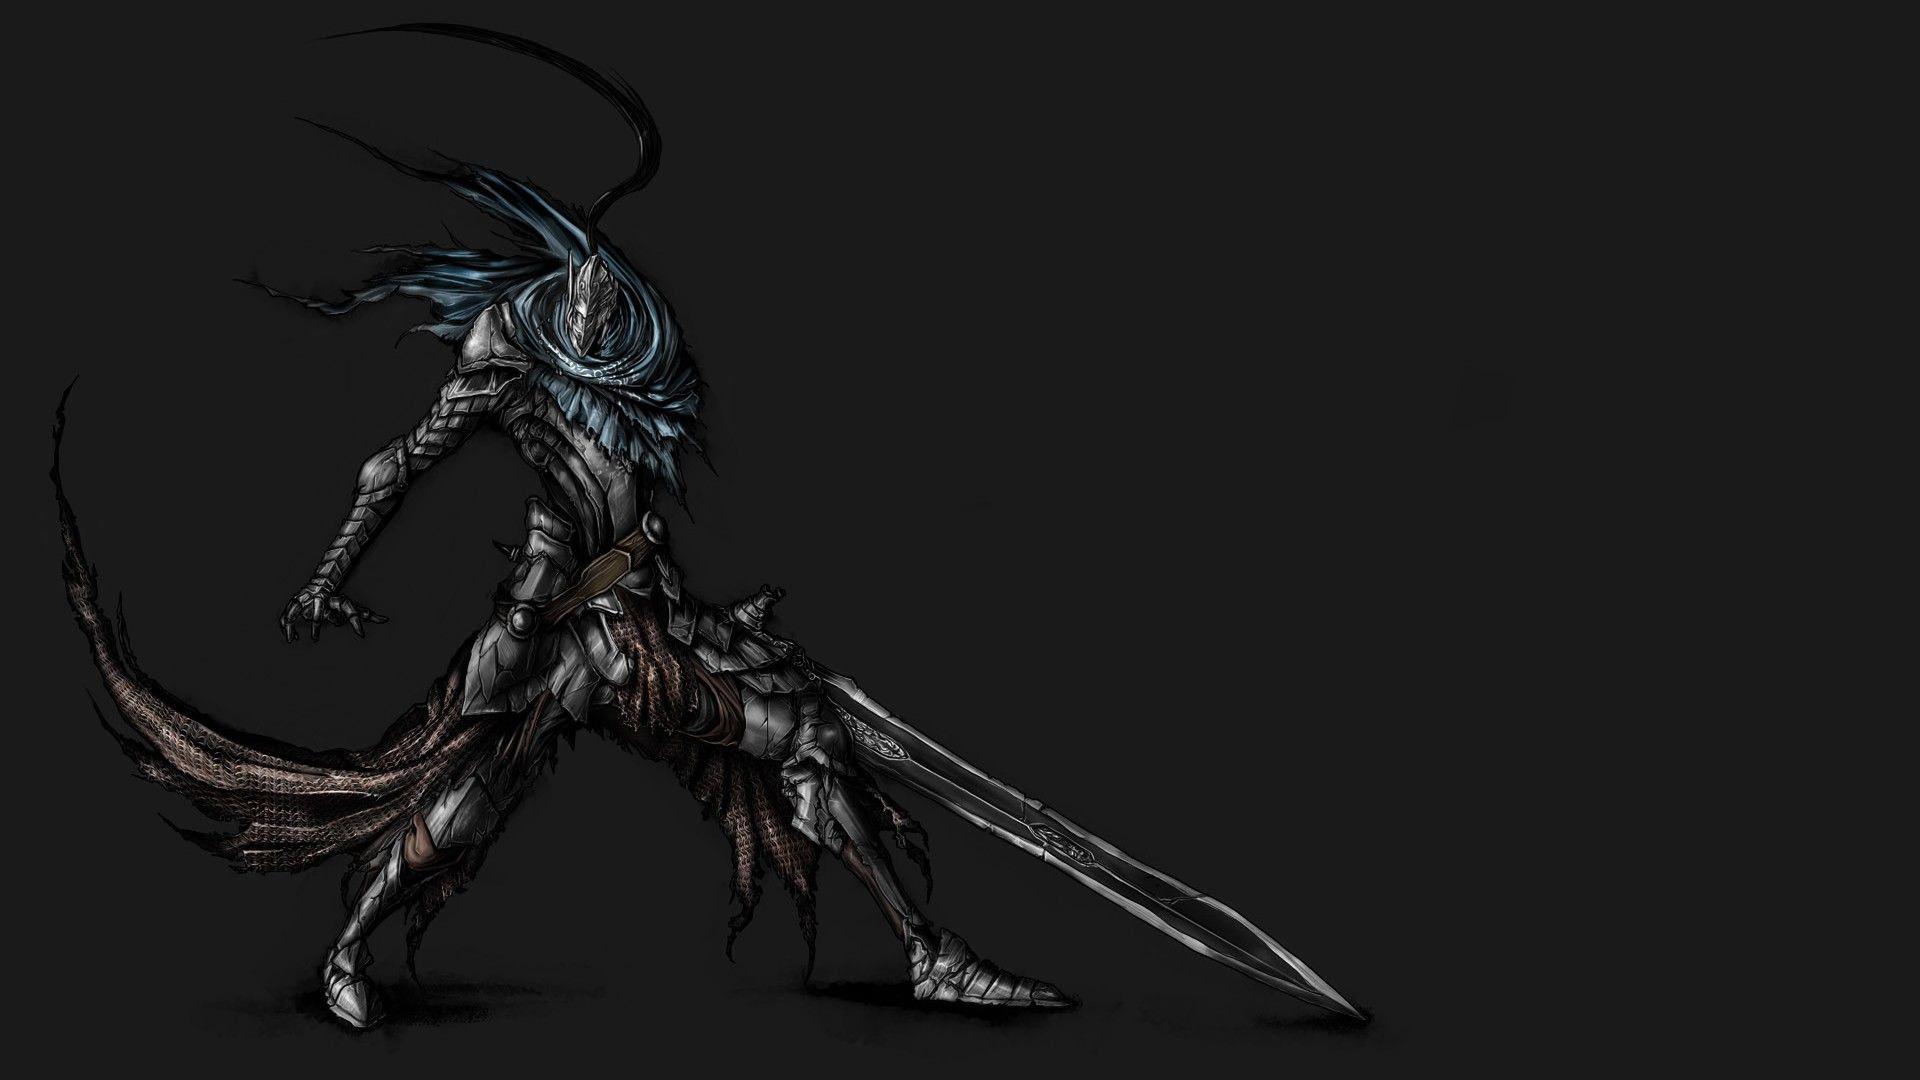 49 Dark Souls Black Knight Wallpaper On Wallpapersafari